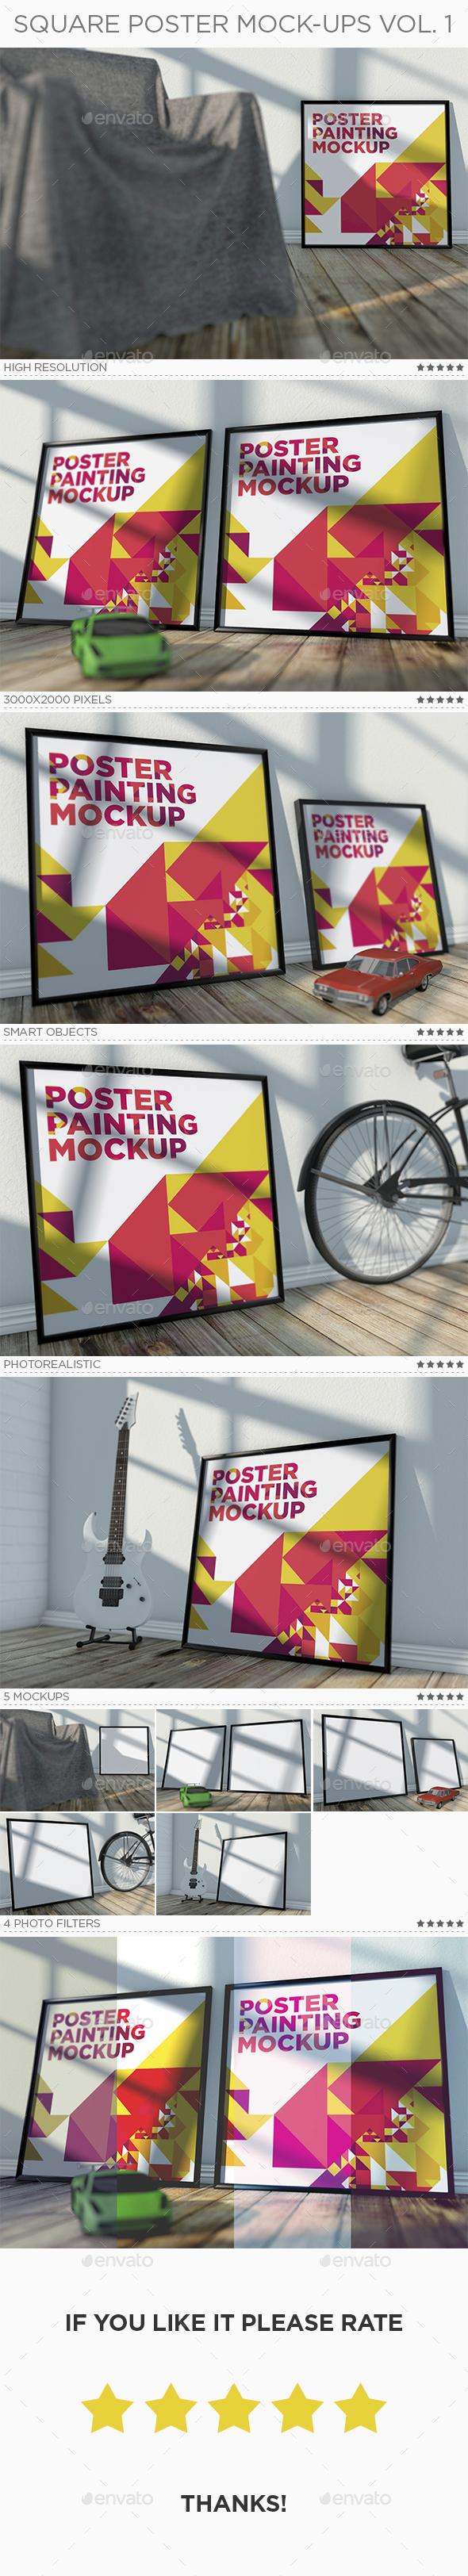 Square Poster Mock-Ups Vol. 1 - Posters Print